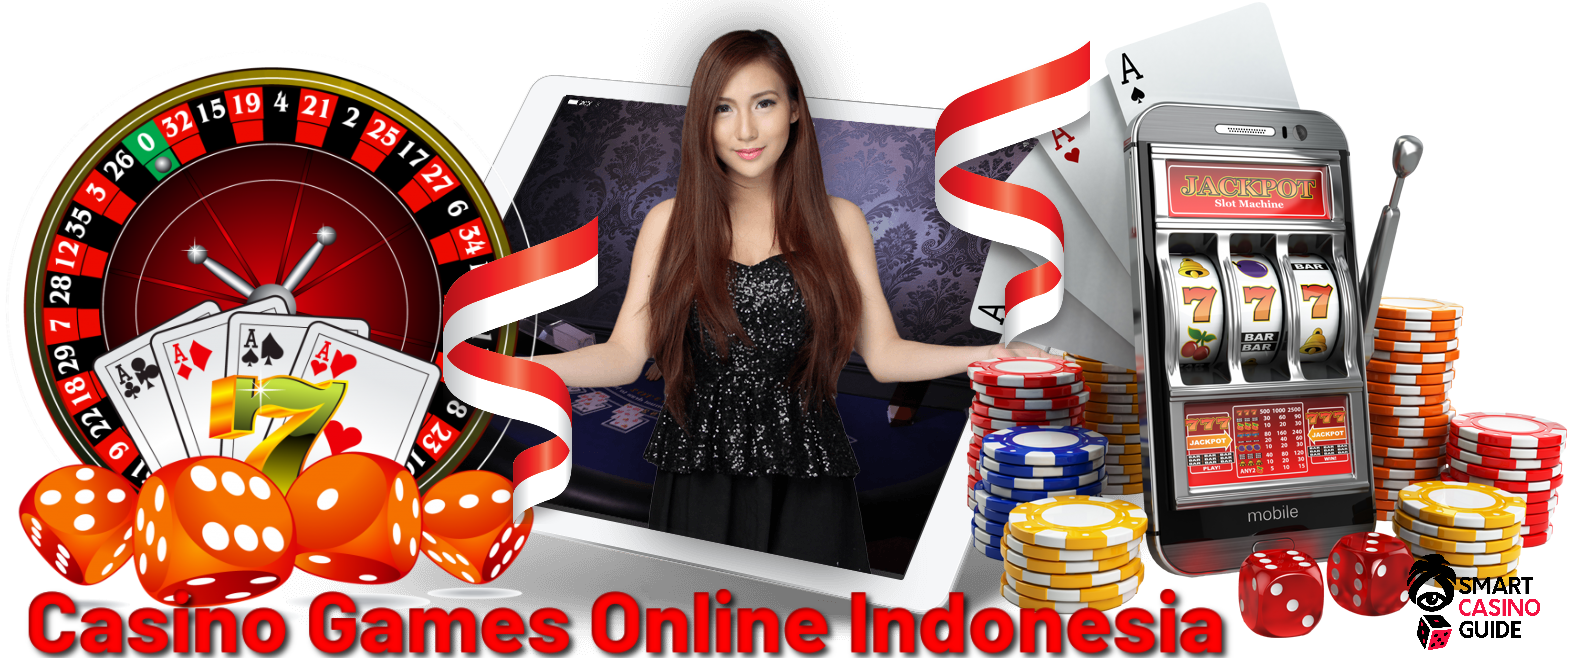 Indonesia Casino Online 2021 Online Gambling